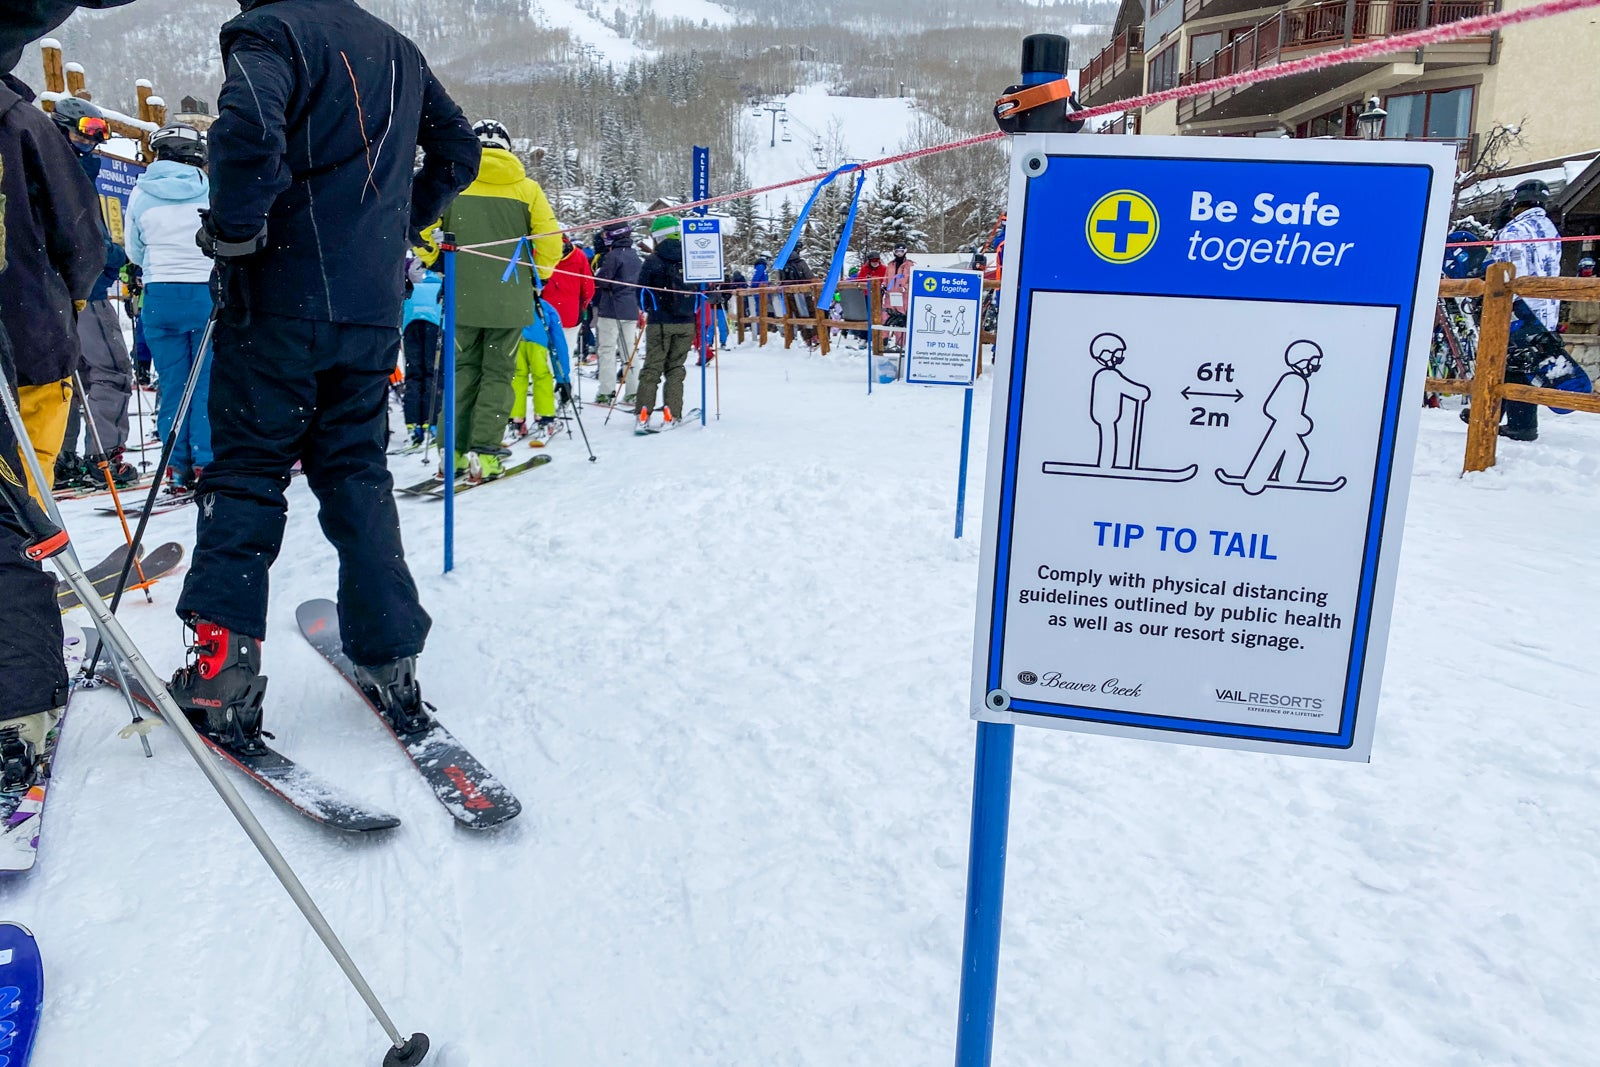 Back to basics: 6 changes I hope ski resorts keep after the pandemic melts away